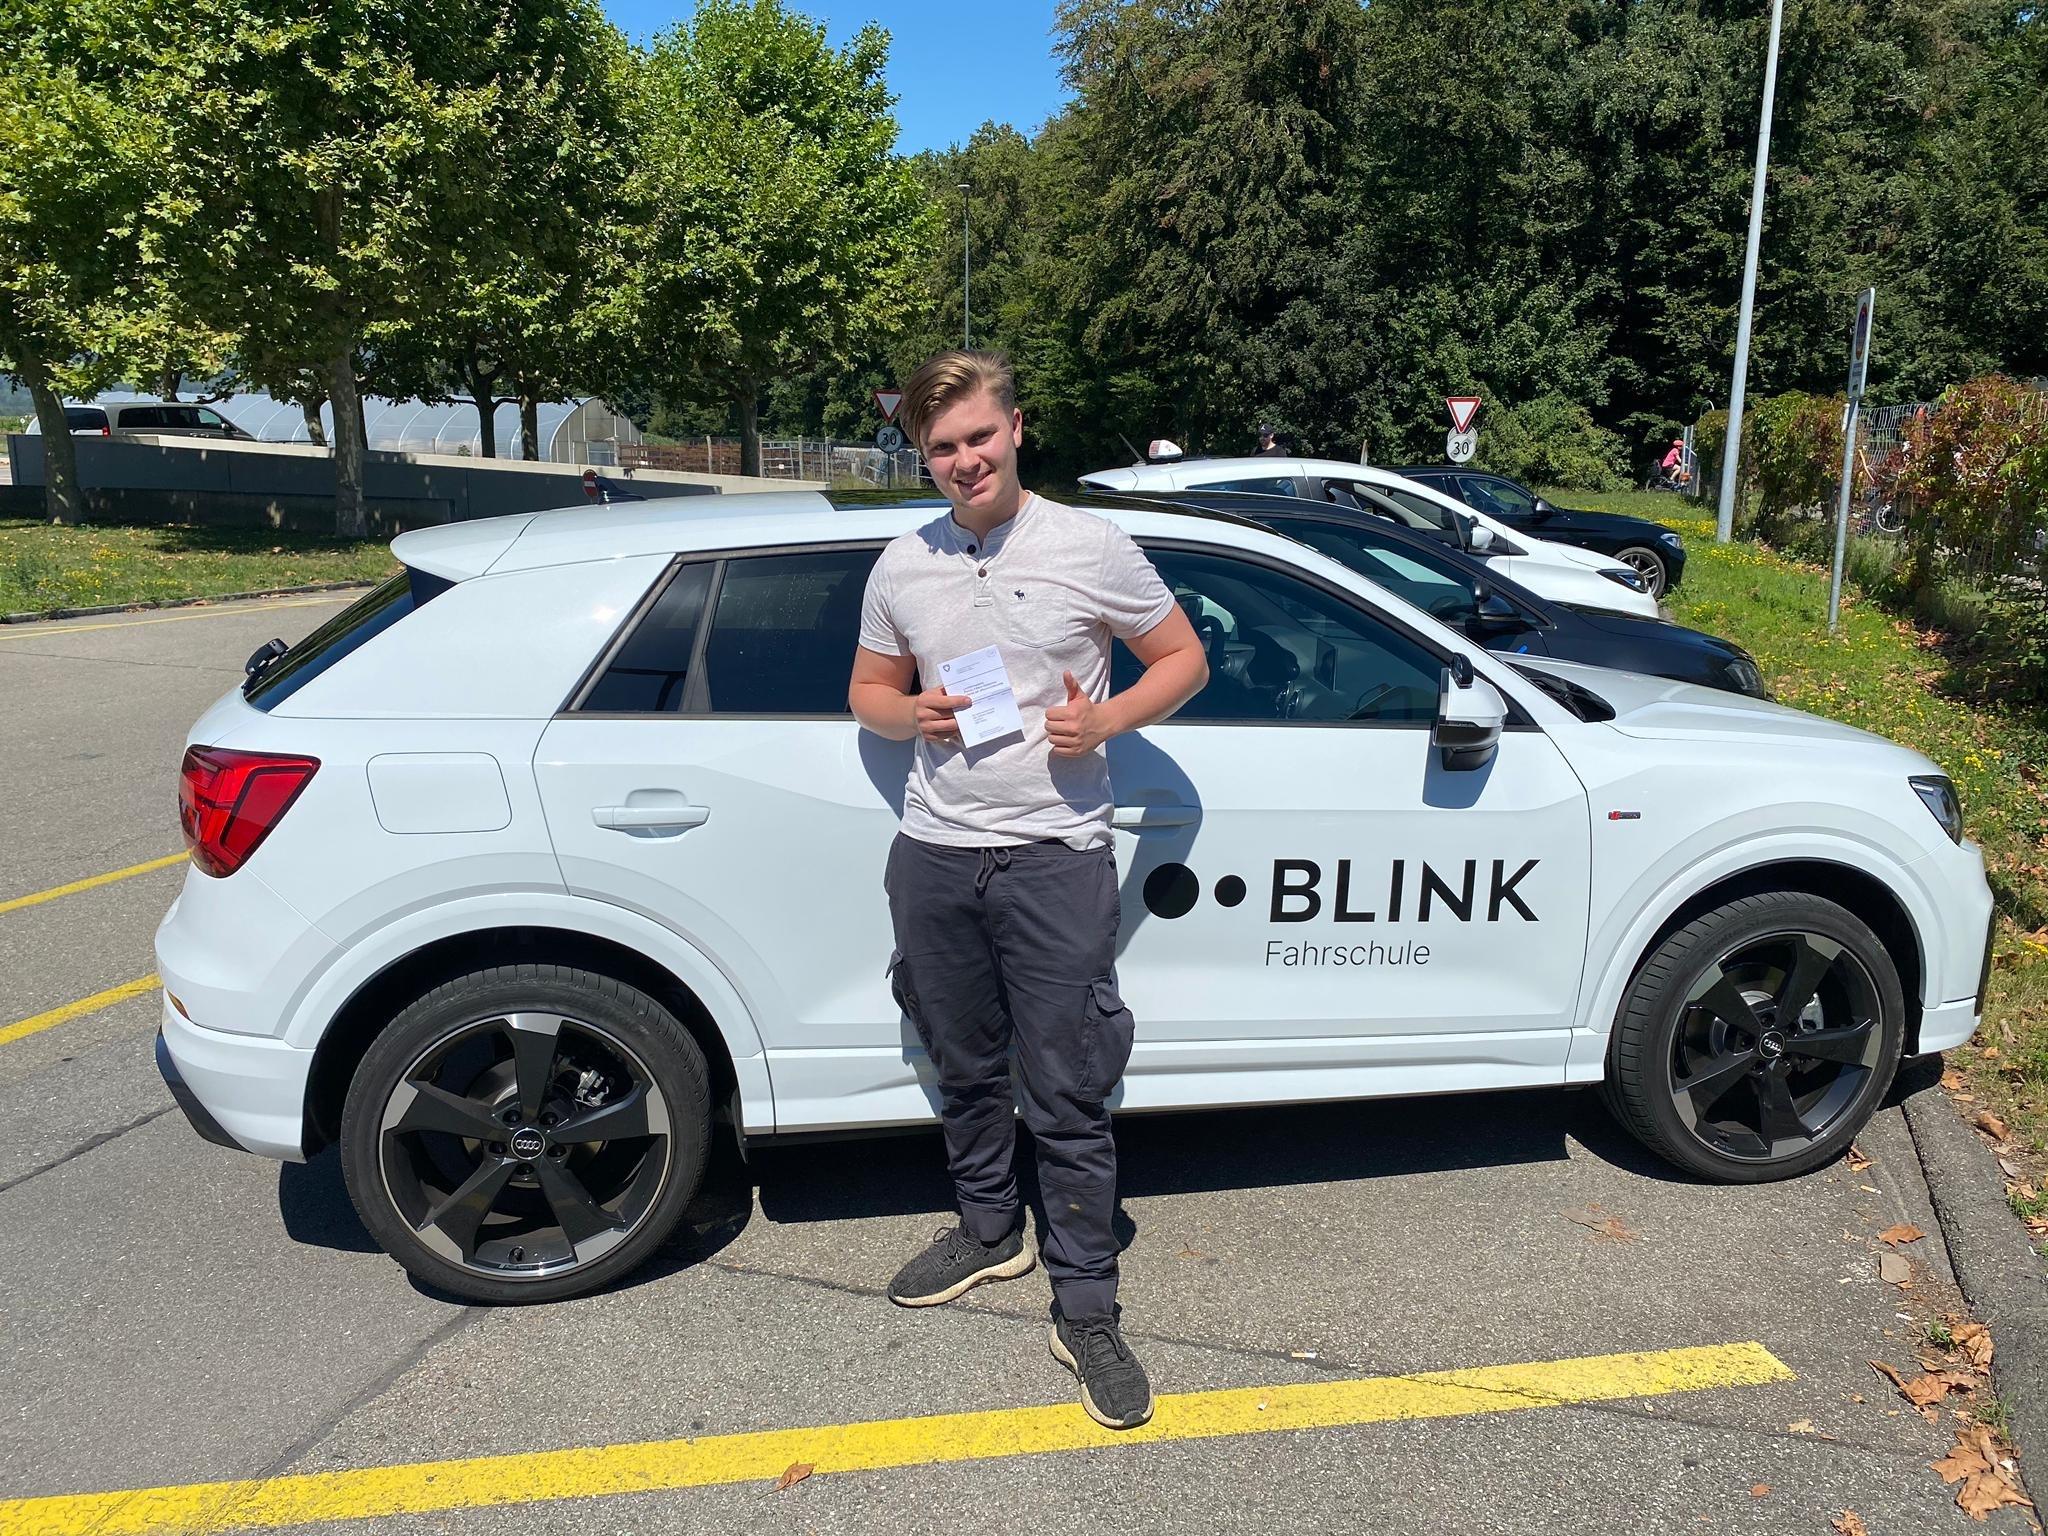 BLINK Fahrschule Aarau   Auto Fahrstunden, Motorrad Grundkurse, VKU